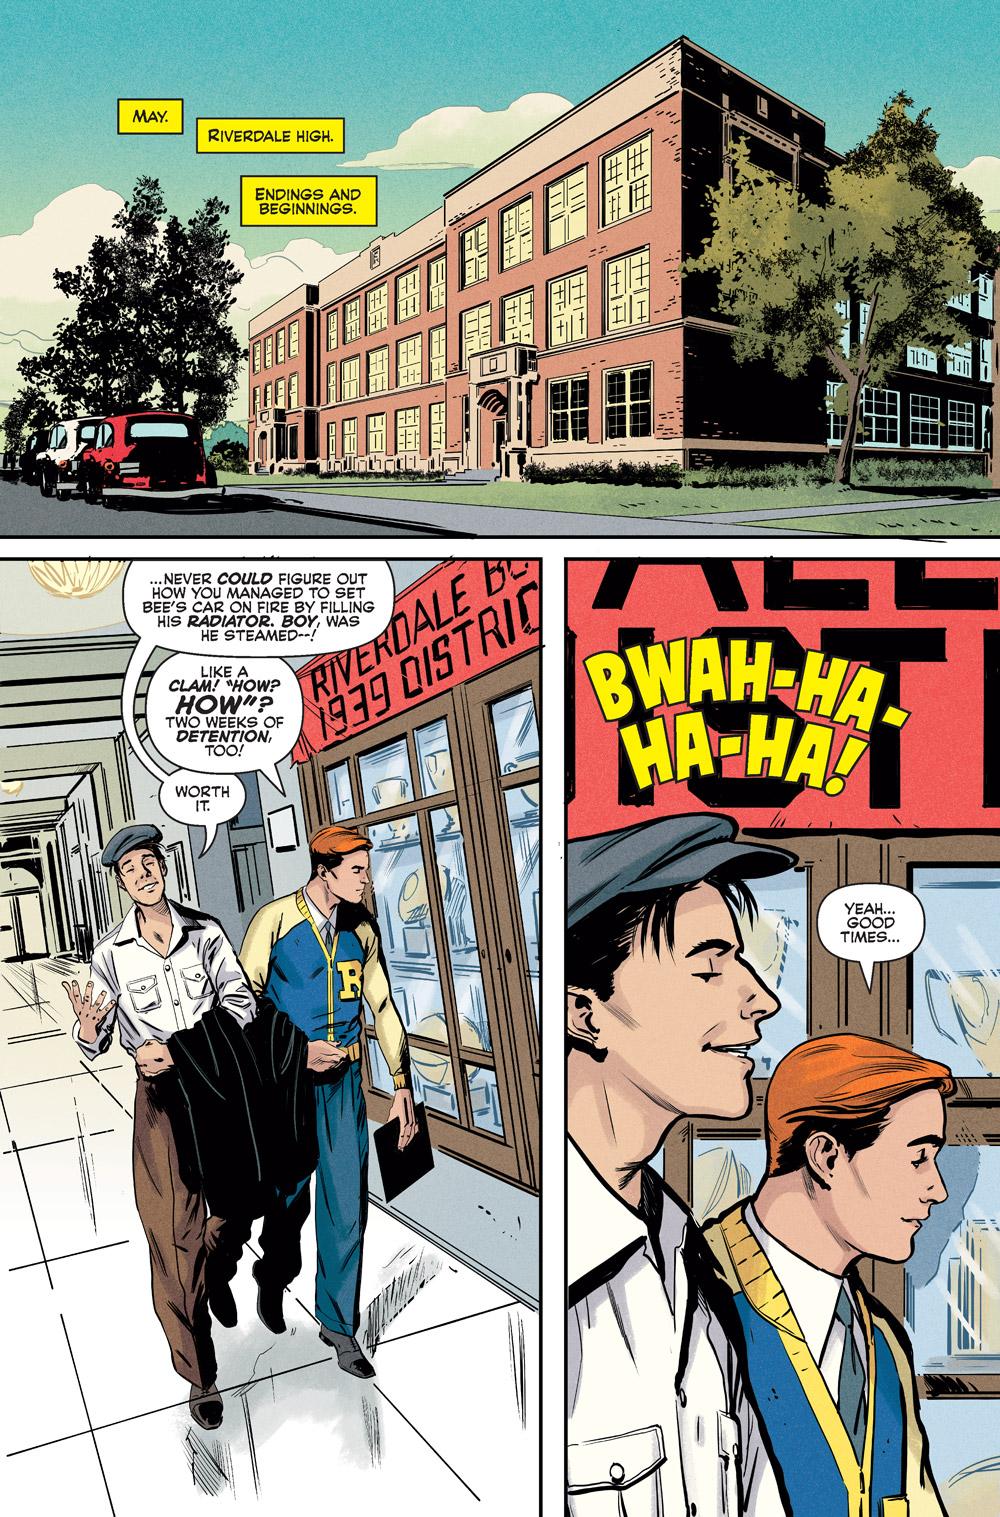 Archie-1941_01_01_col.jpg